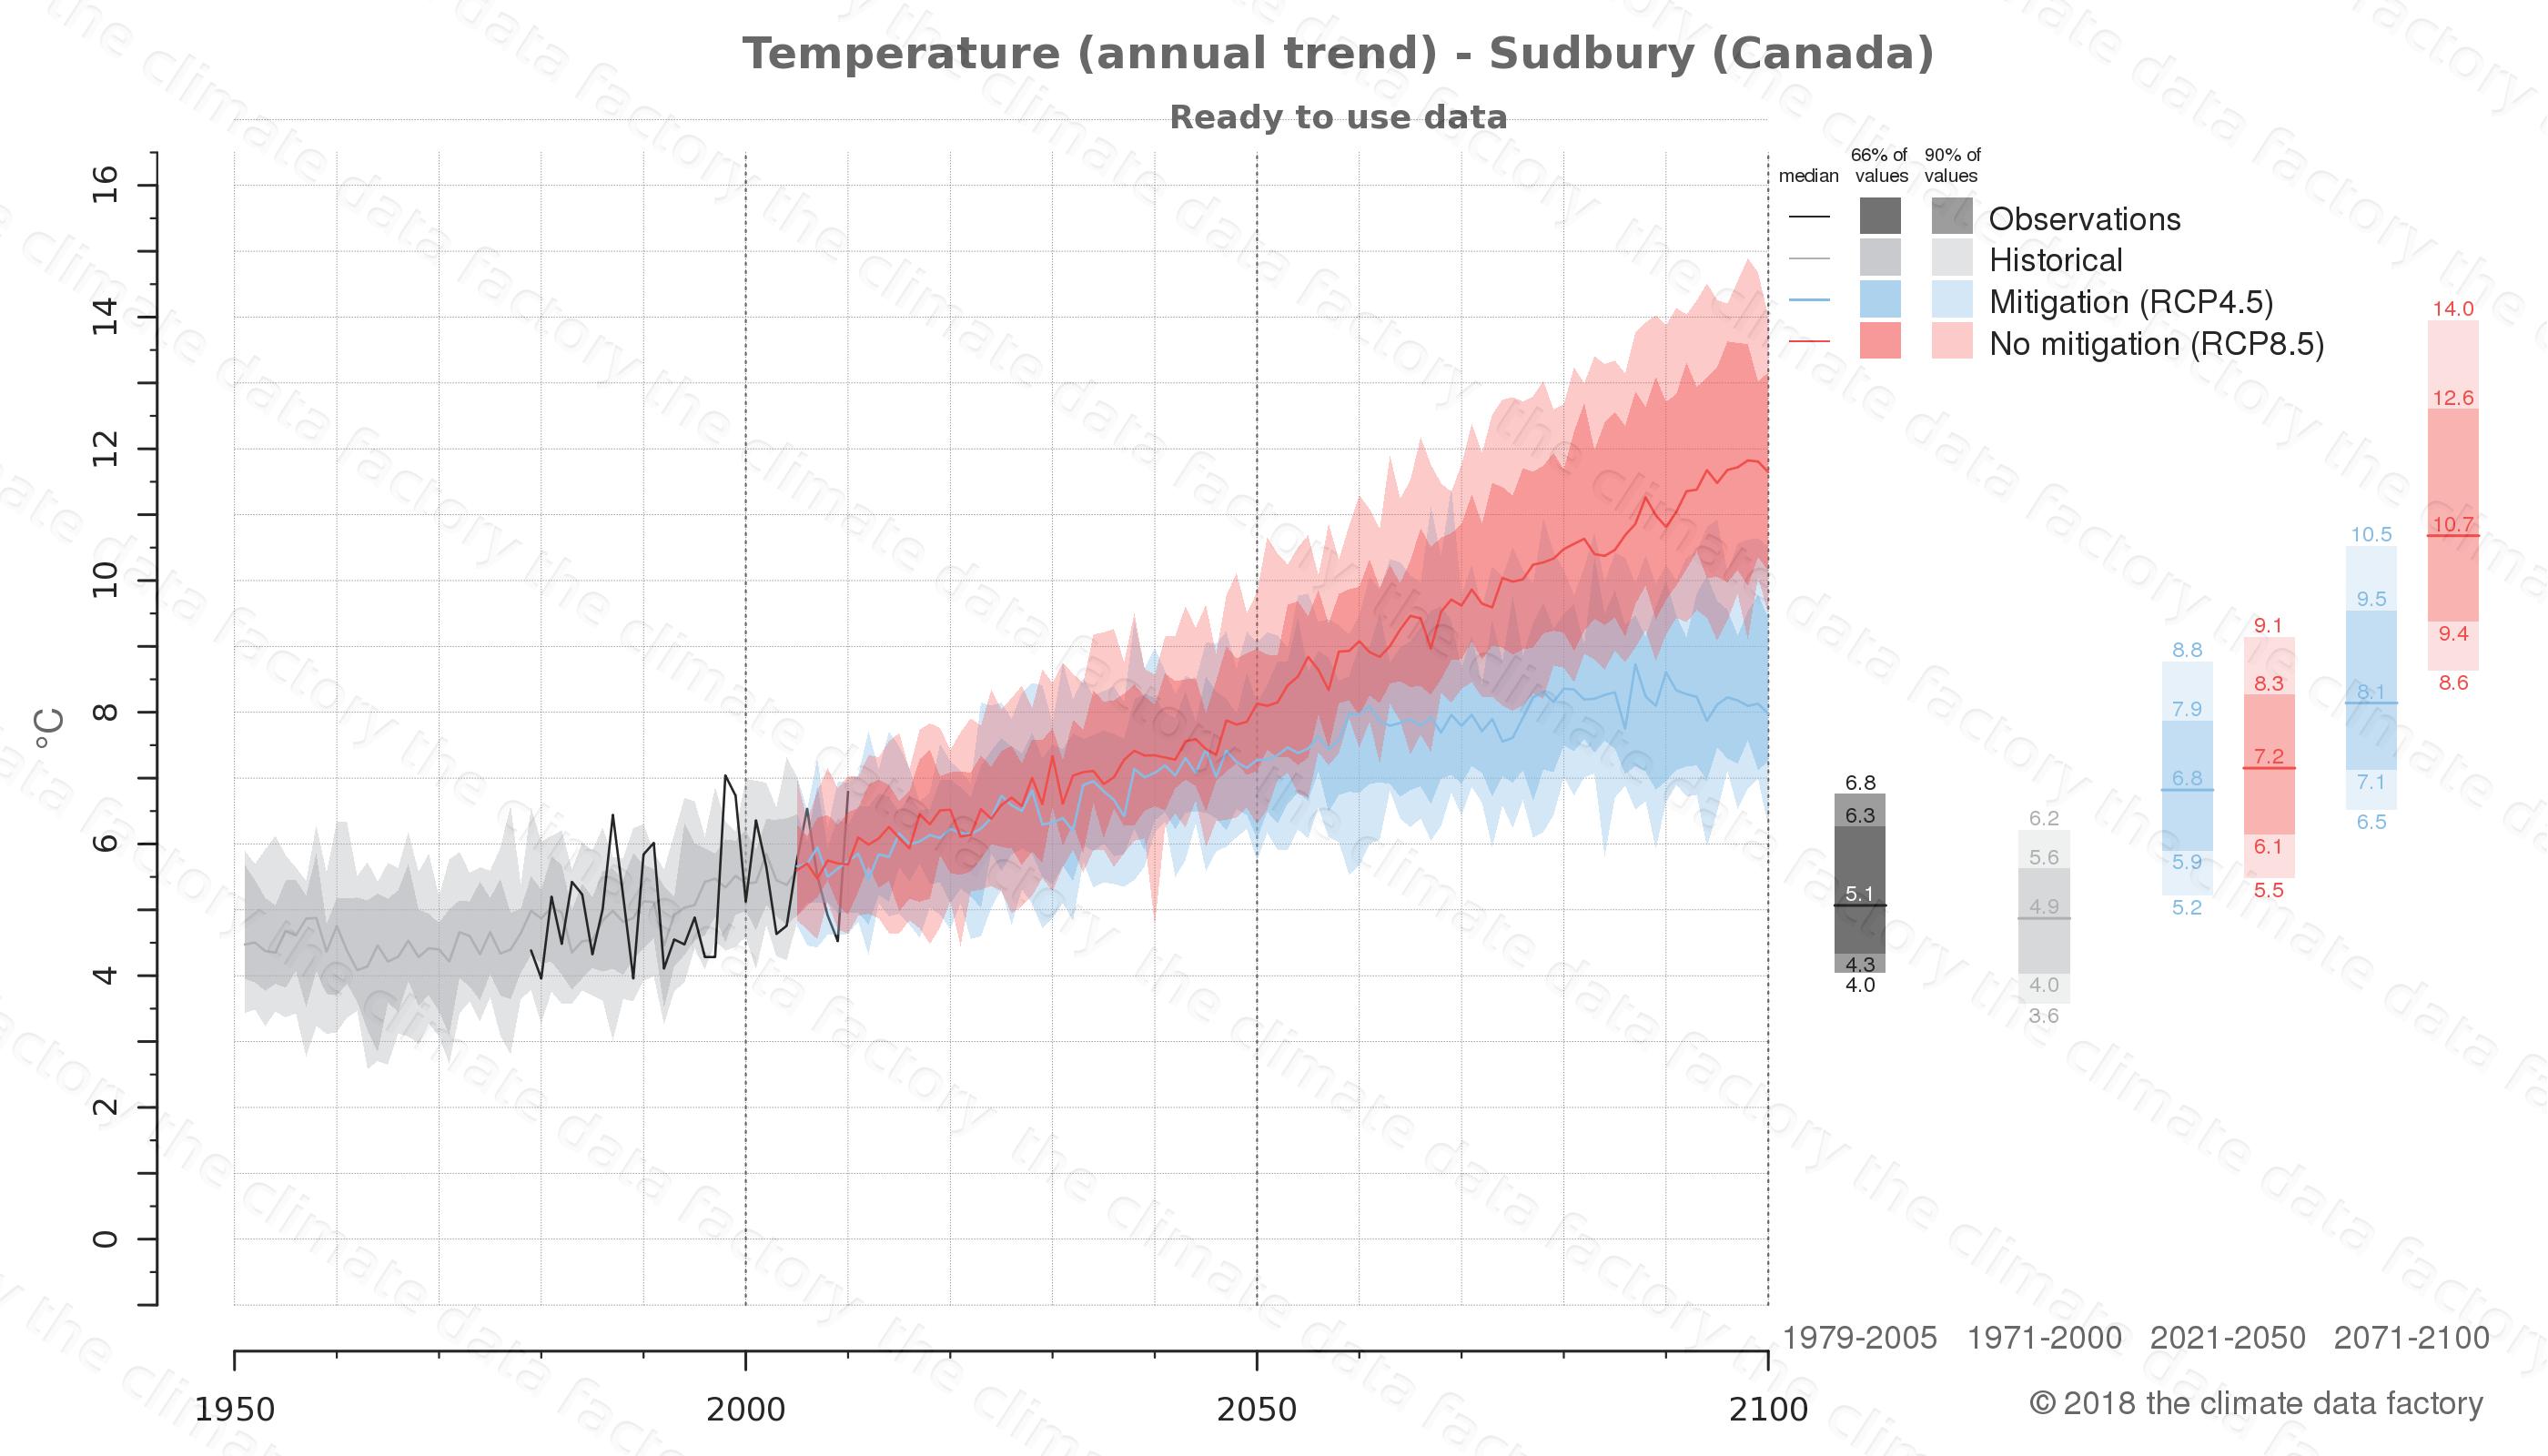 climate change data policy adaptation climate graph city data temperature sudbury canada